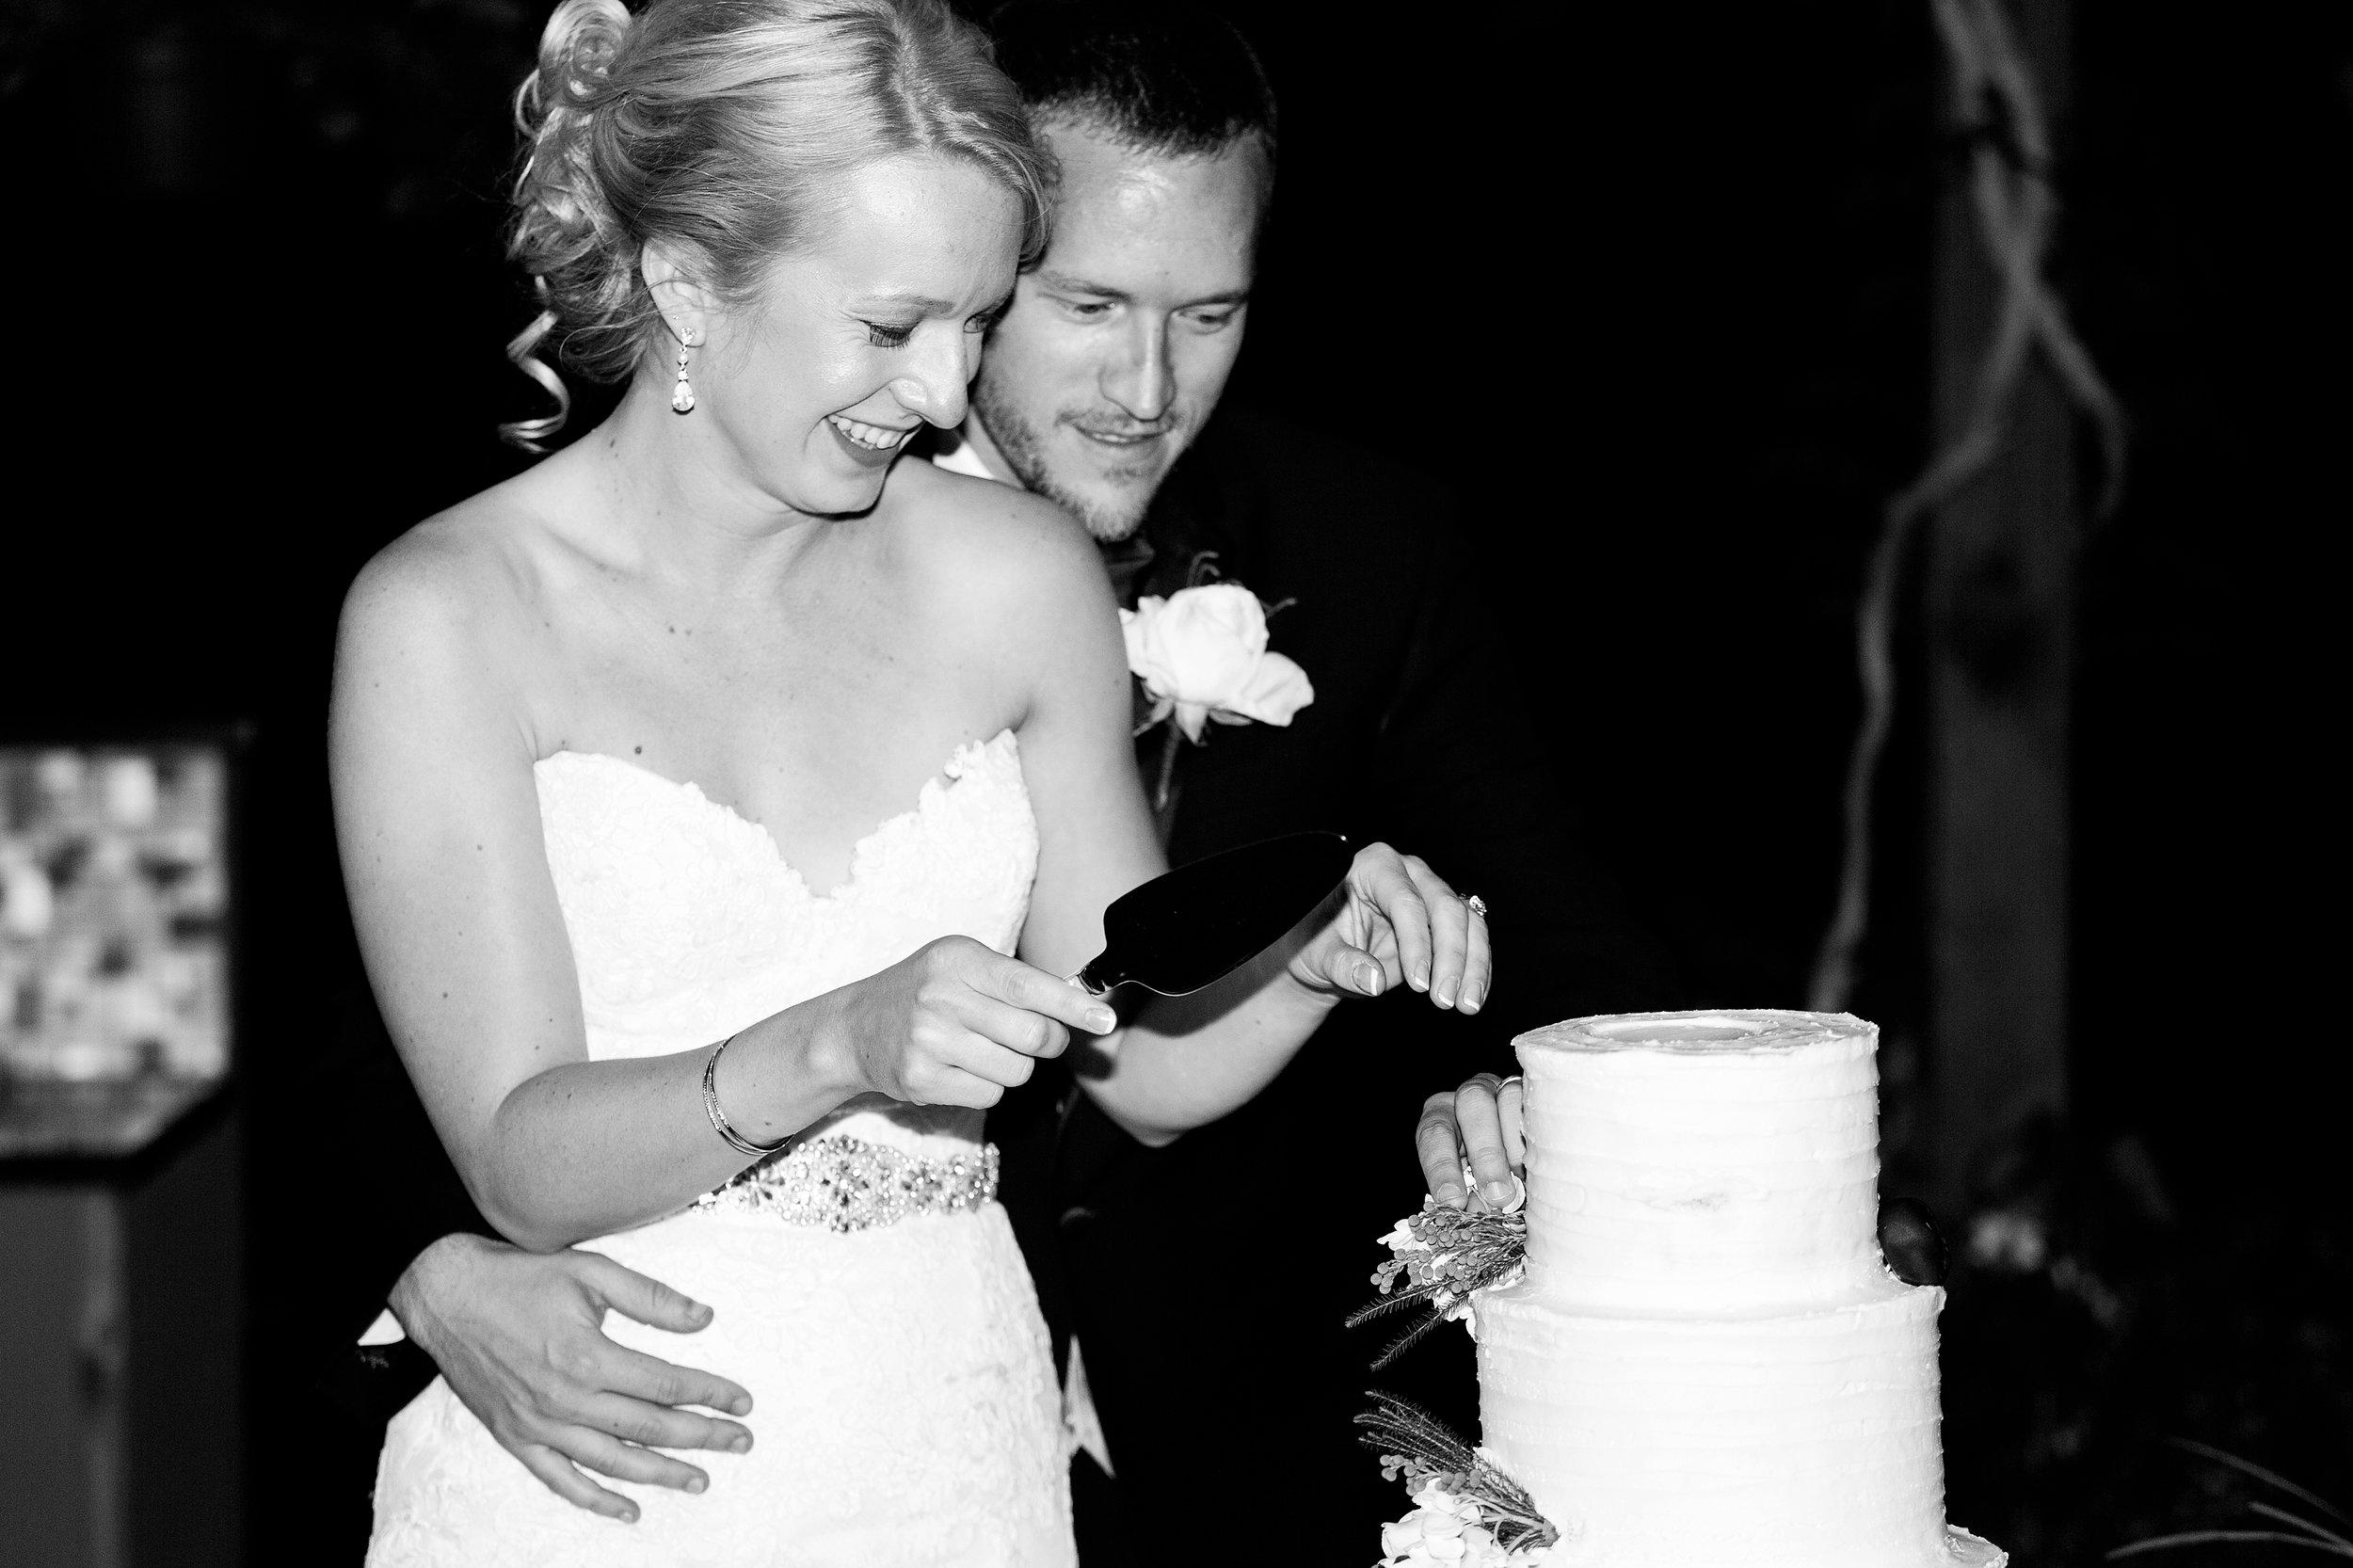 seattle wedding photographer_0375.jpg